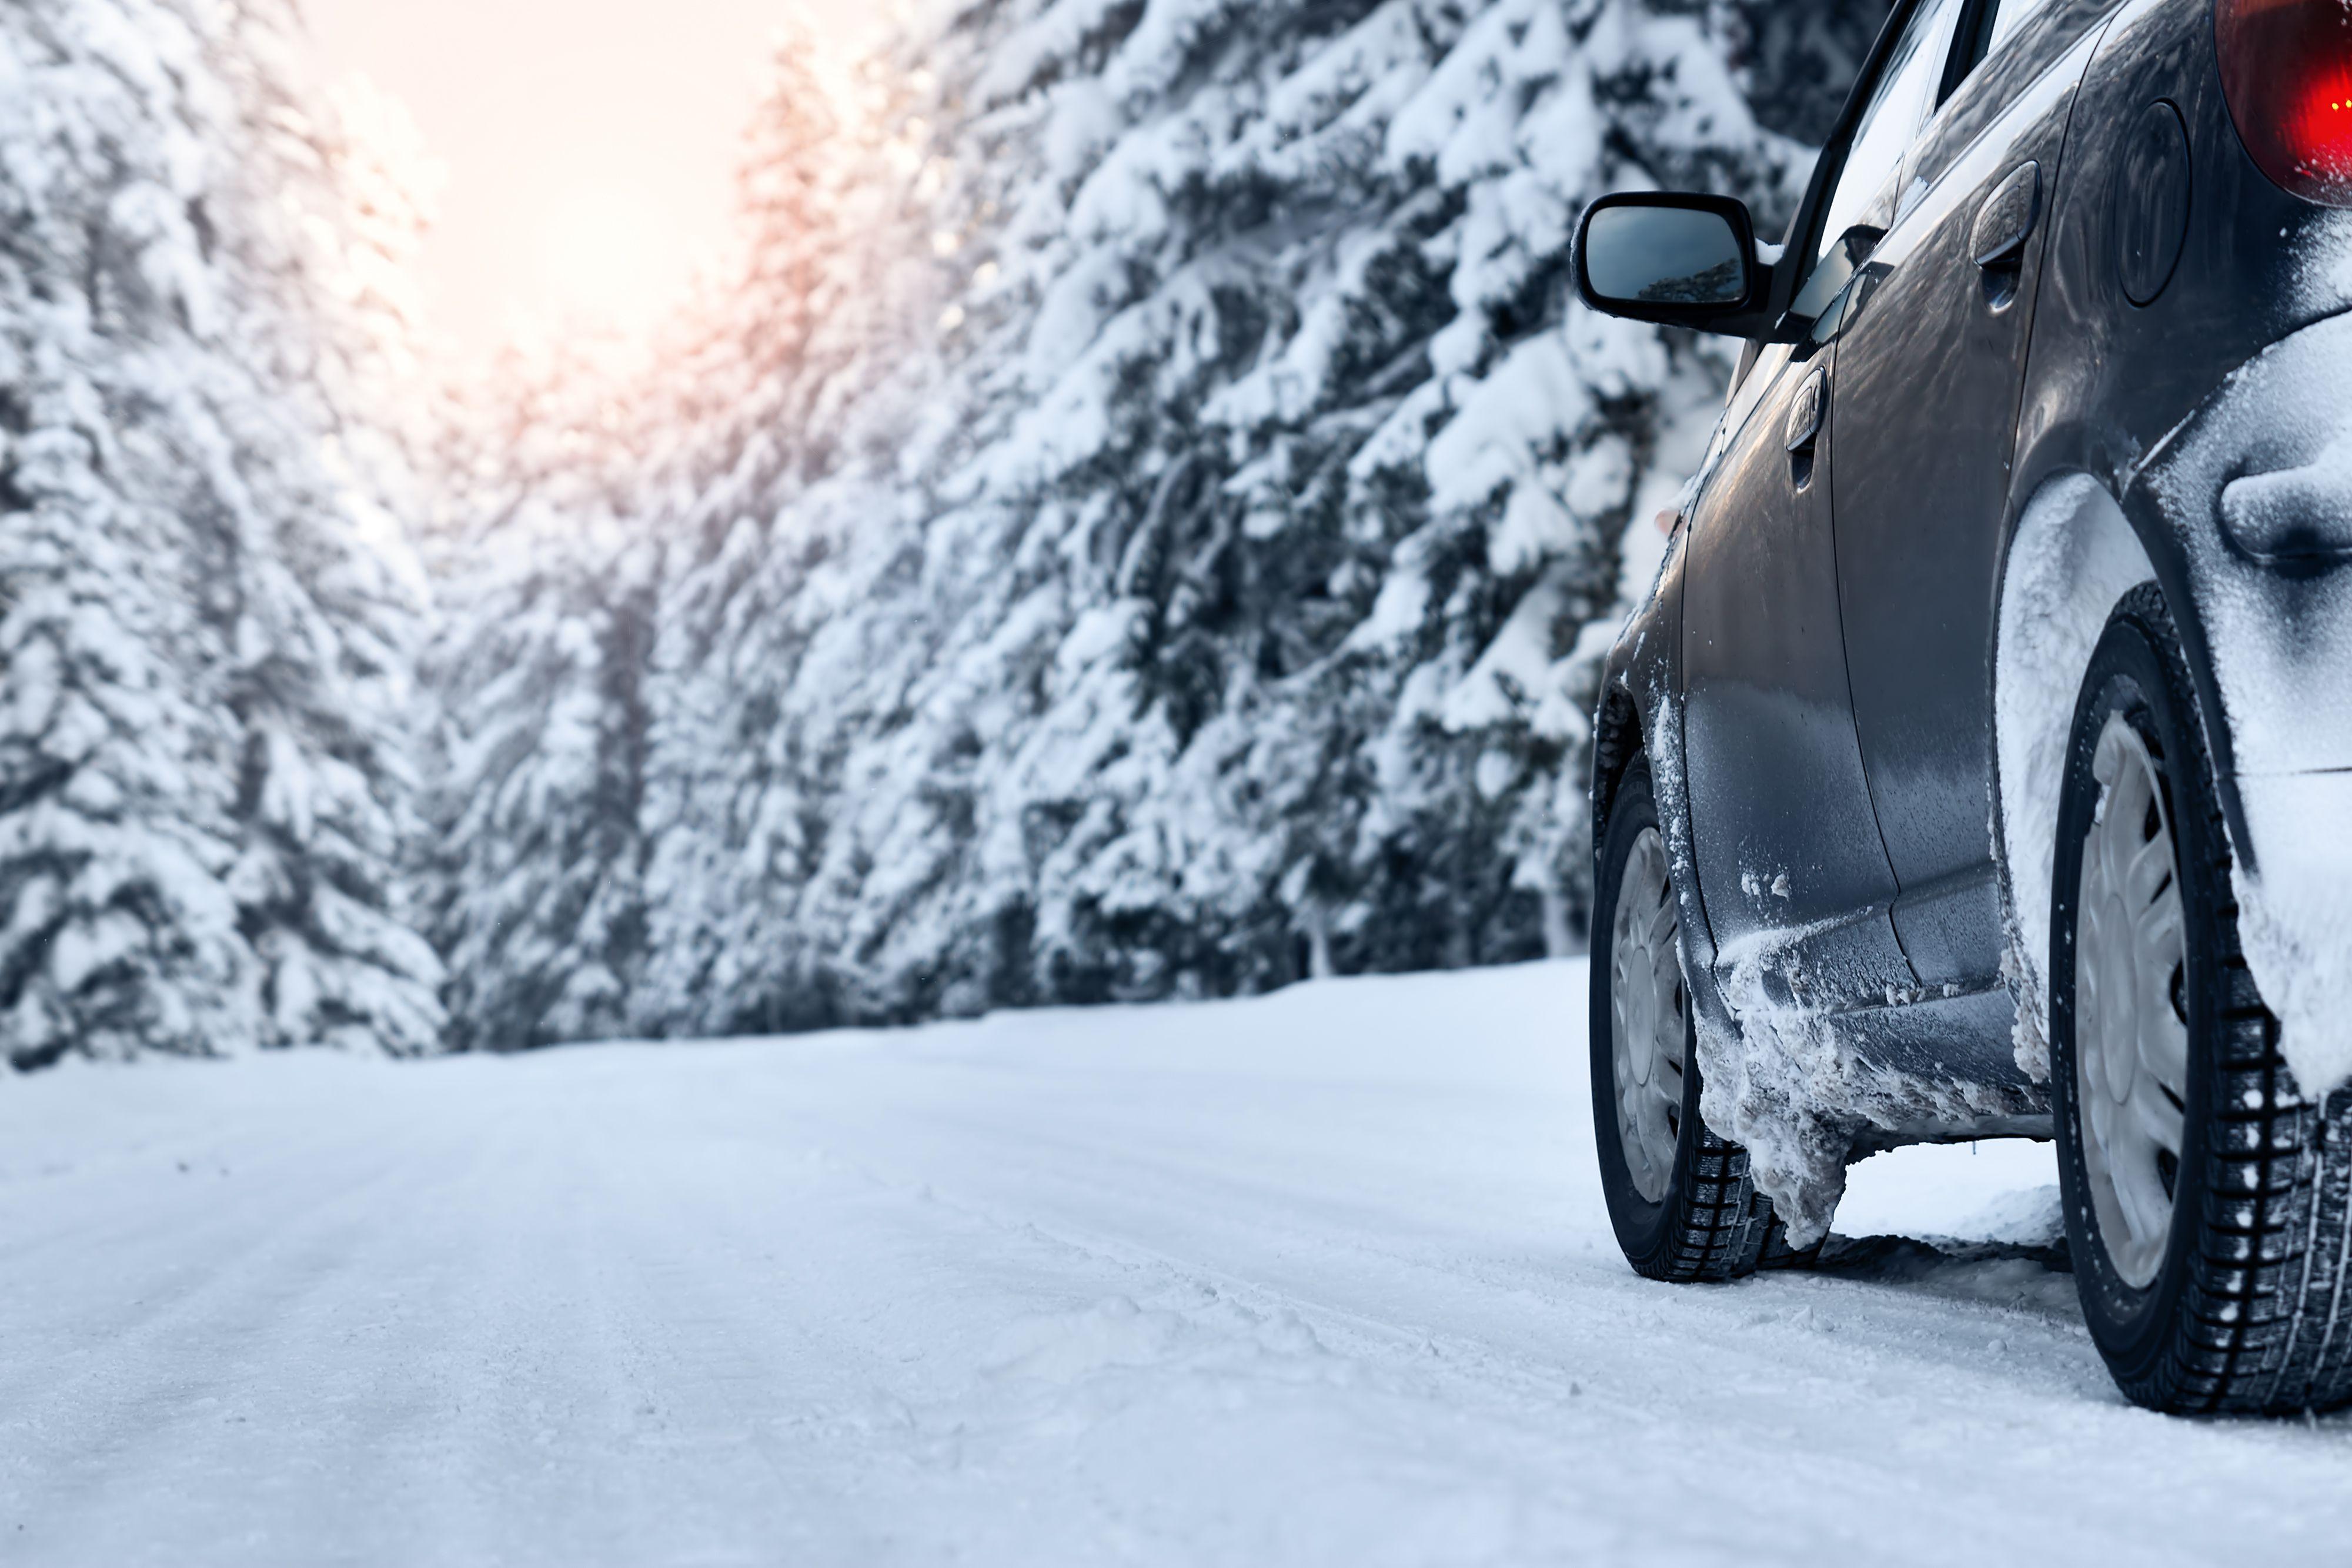 snow driving .jpg (720 KB)